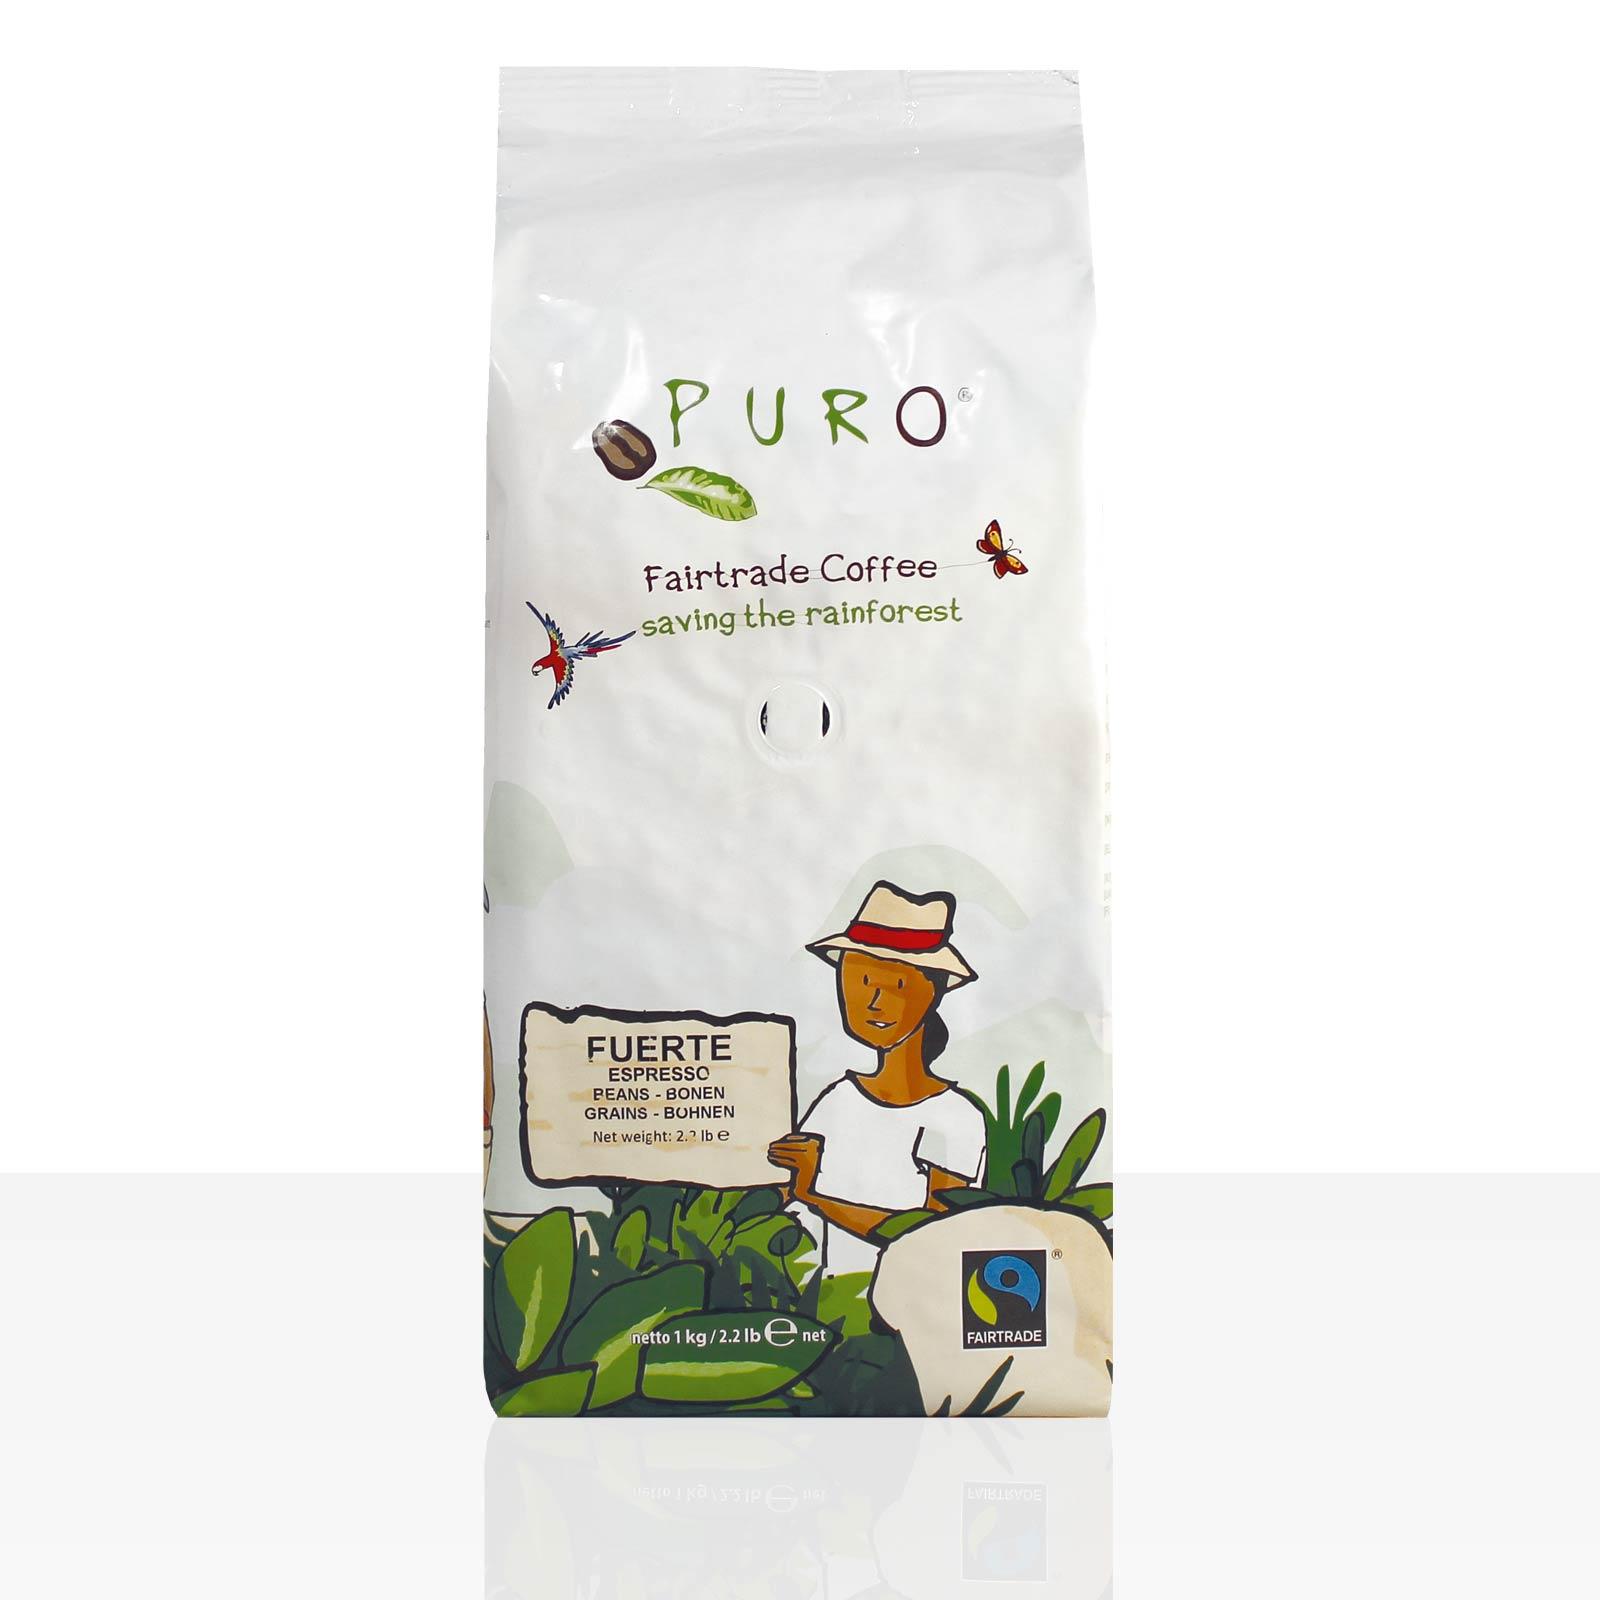 Miko Puro Fairtrade Fuerte 9 x 1kg Espresso ganze Bohne